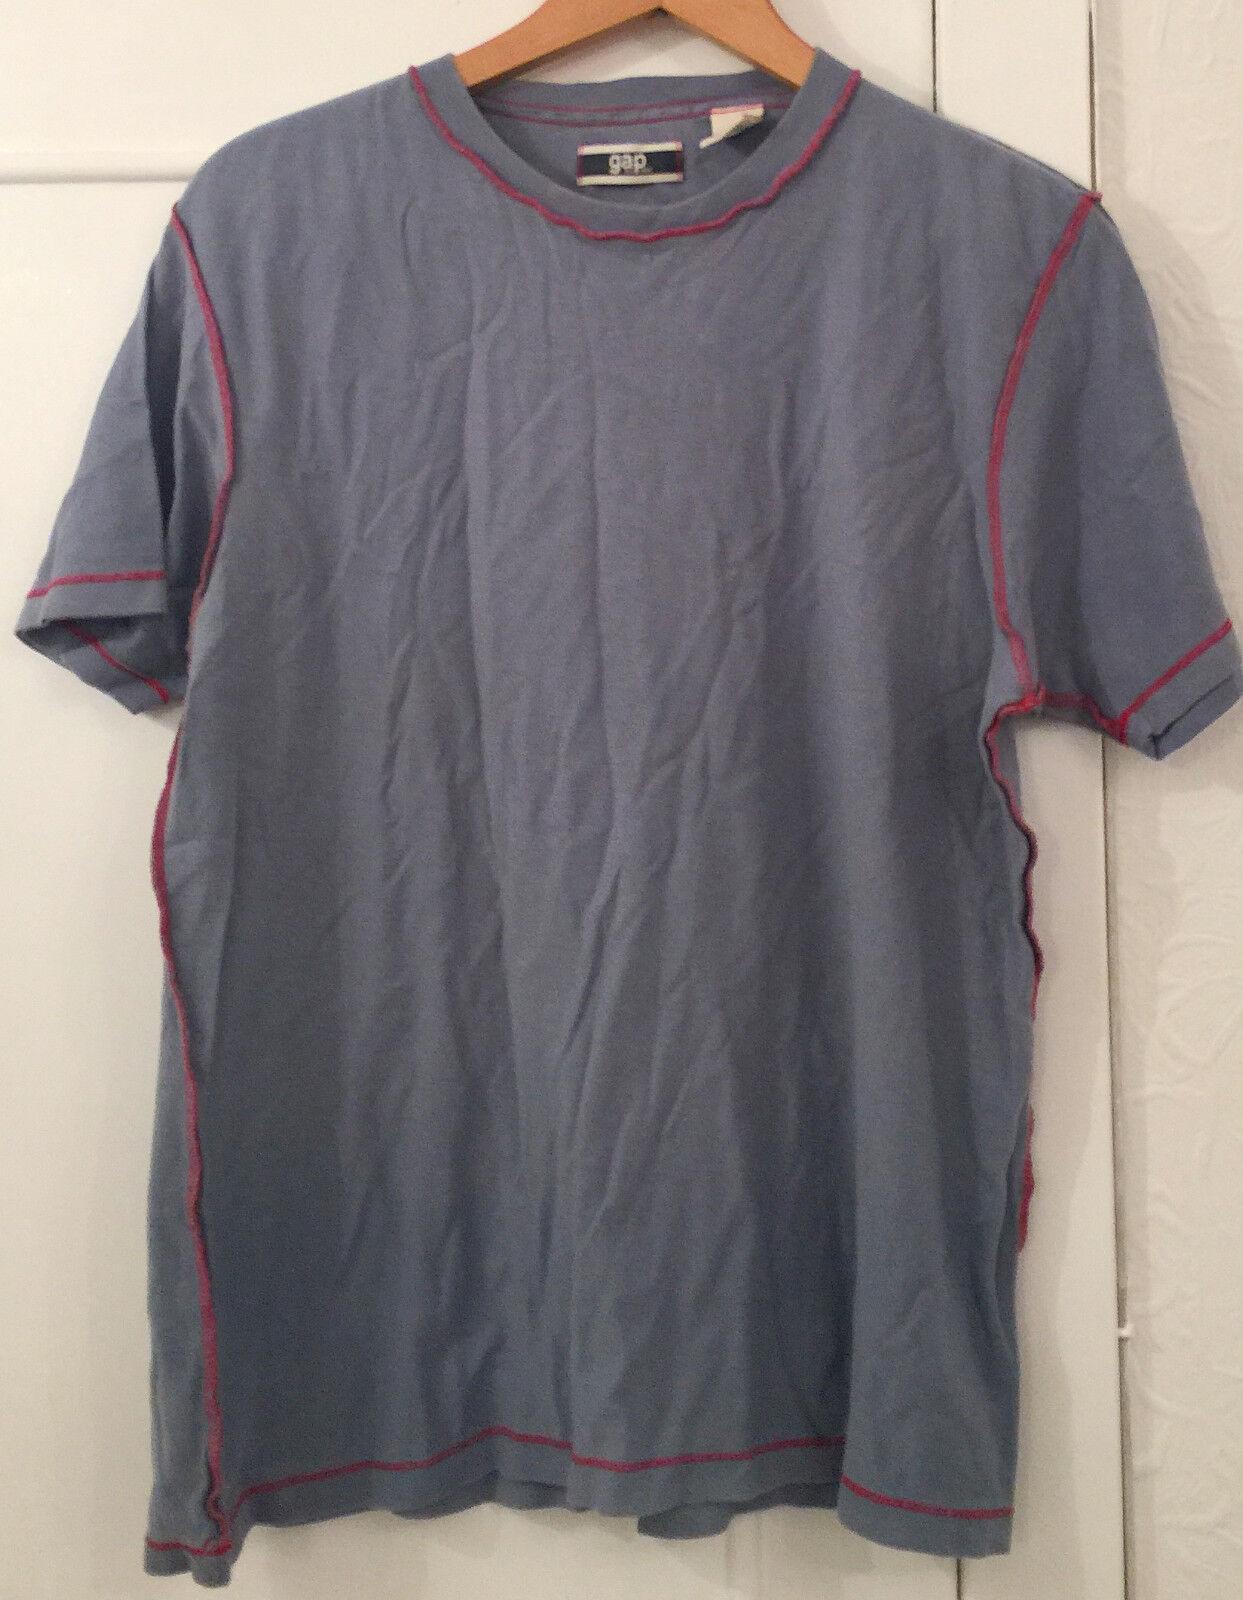 M Gap Taille Bleu Homme Shirt T wBgWqqFX